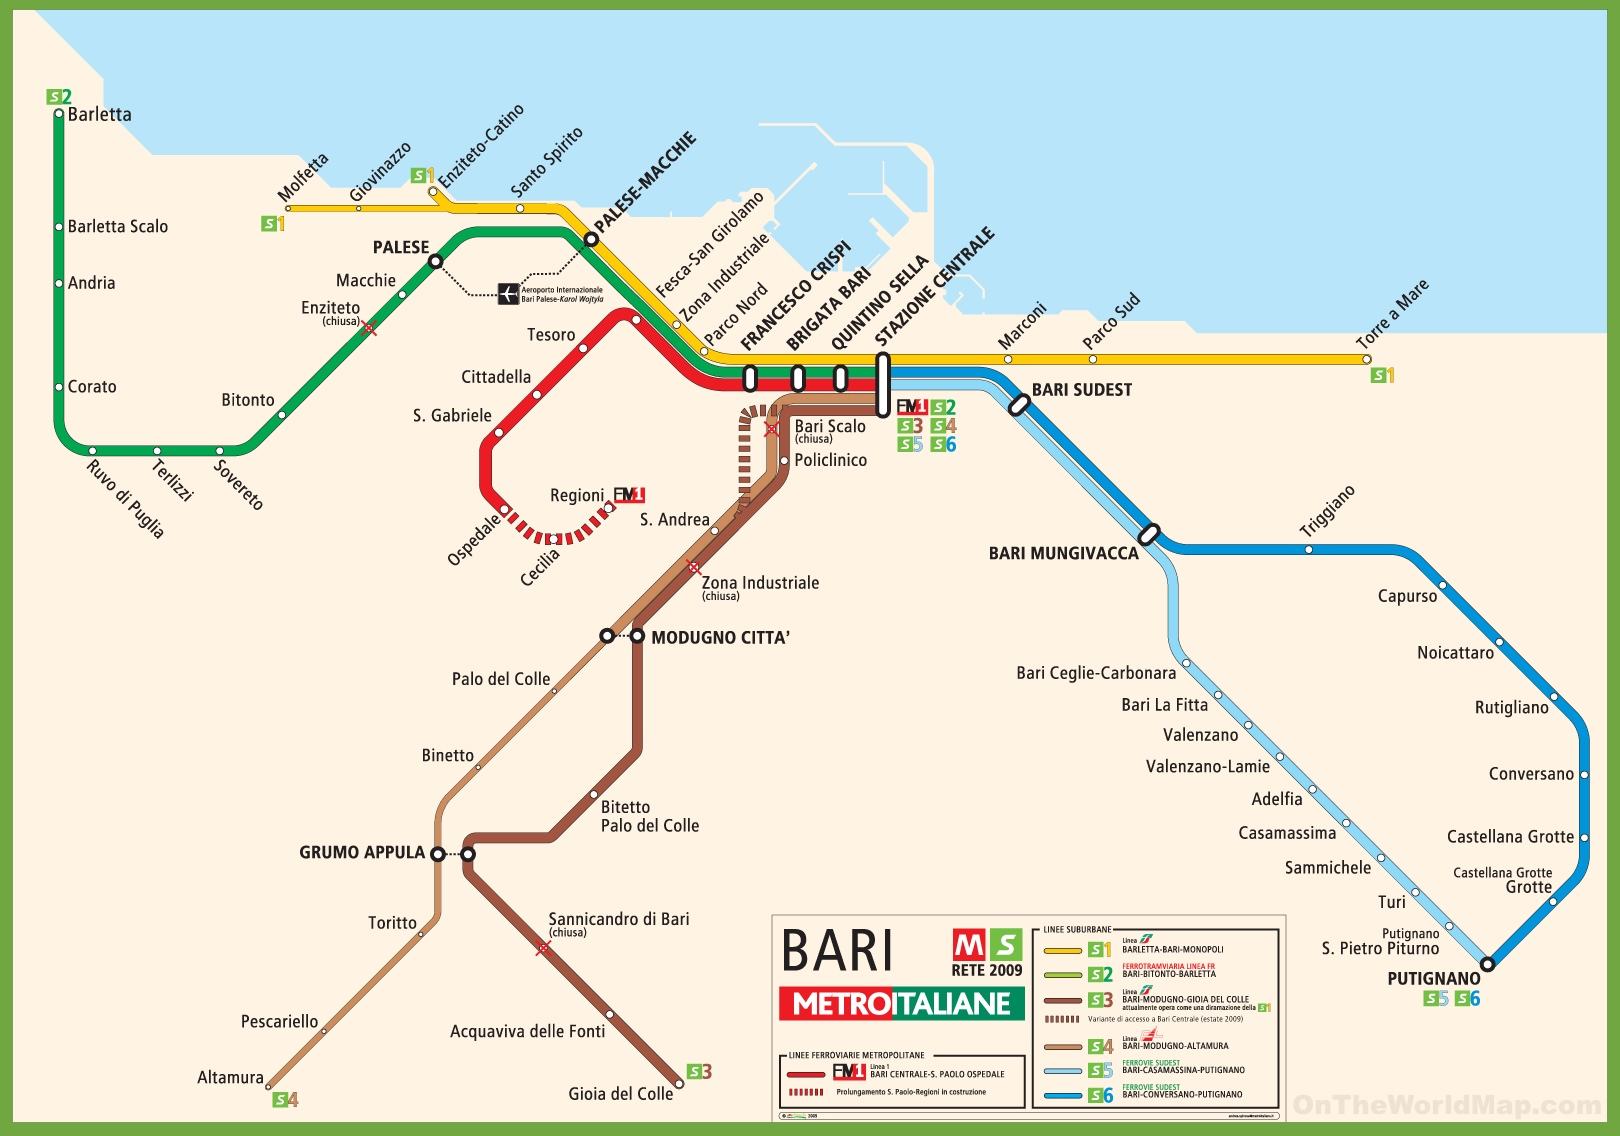 Bari metro map